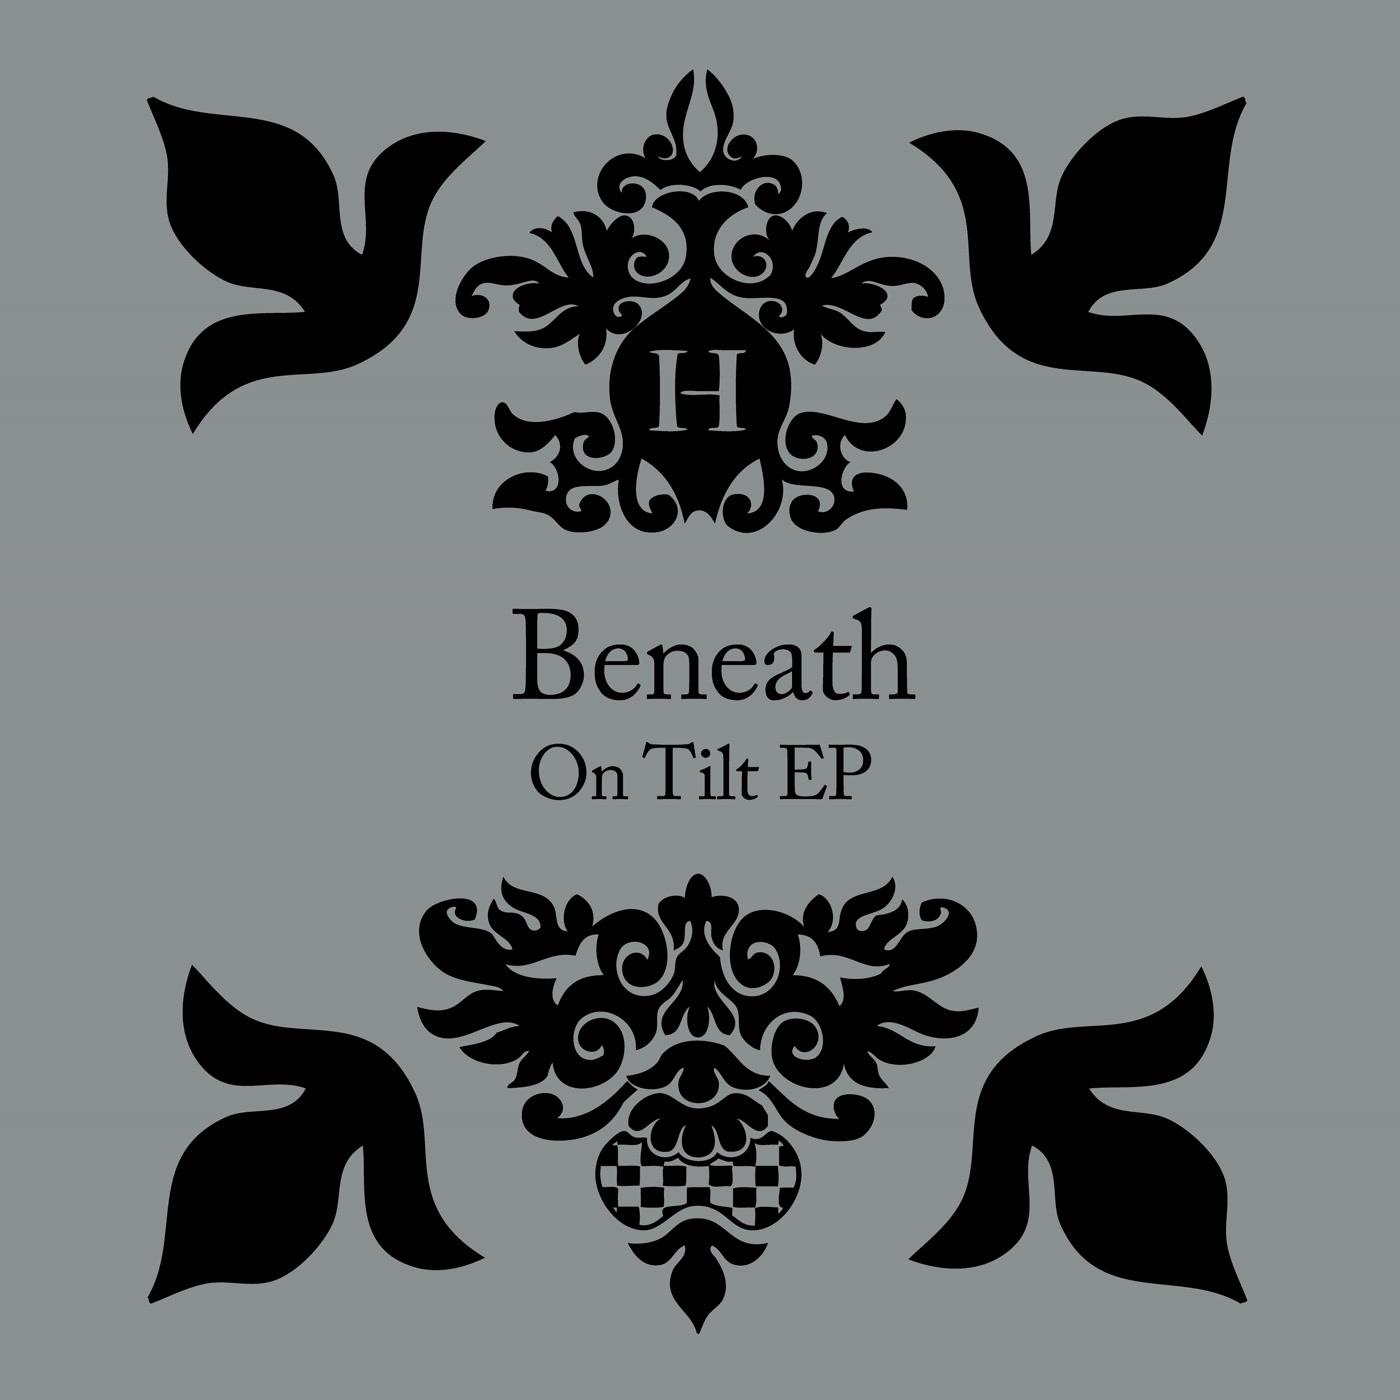 Beneath – On Tilt EP (Hemlock Recordings)